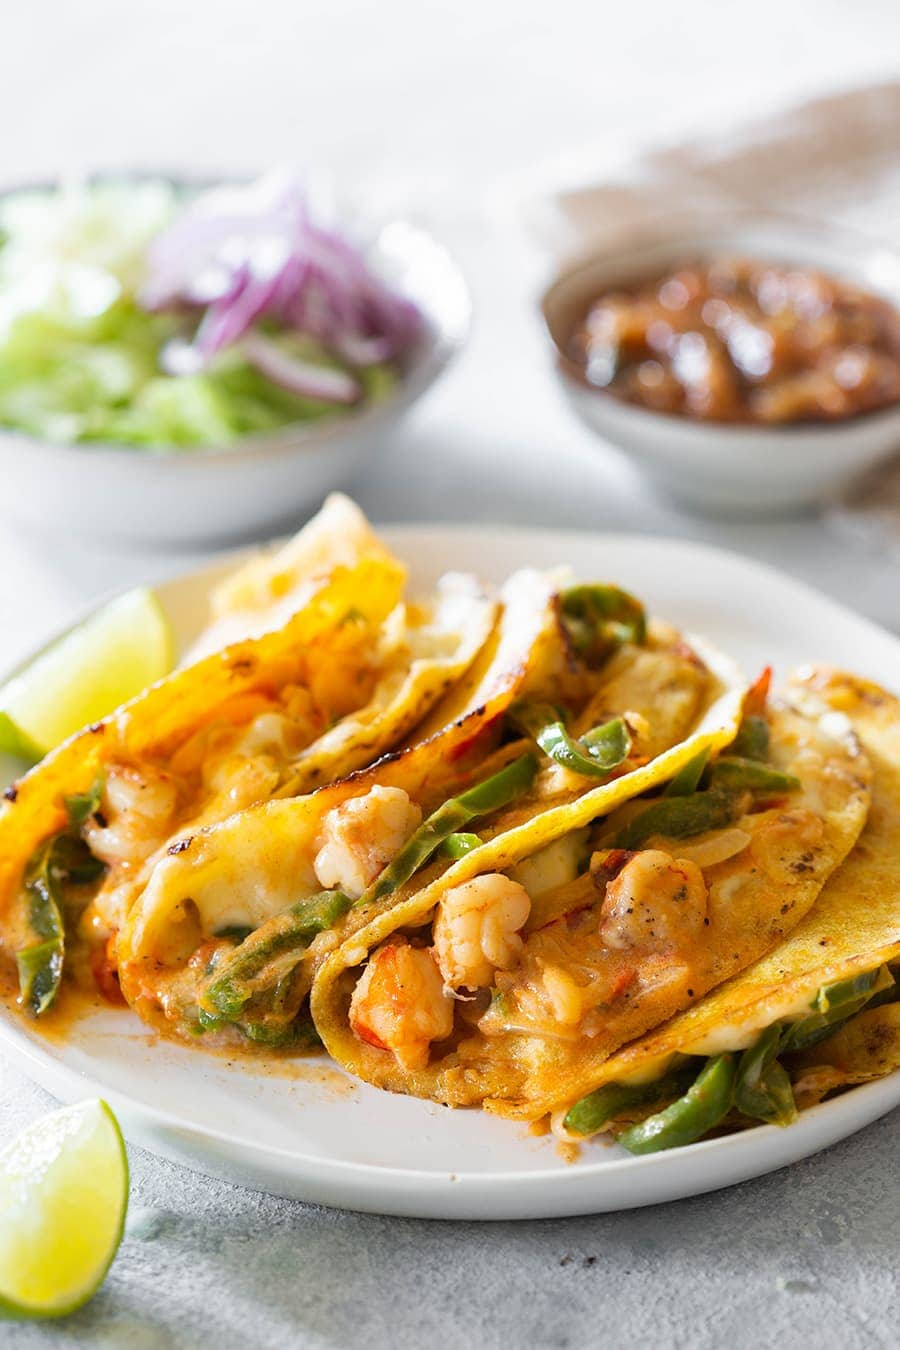 Tacos gobernador with various toppings.